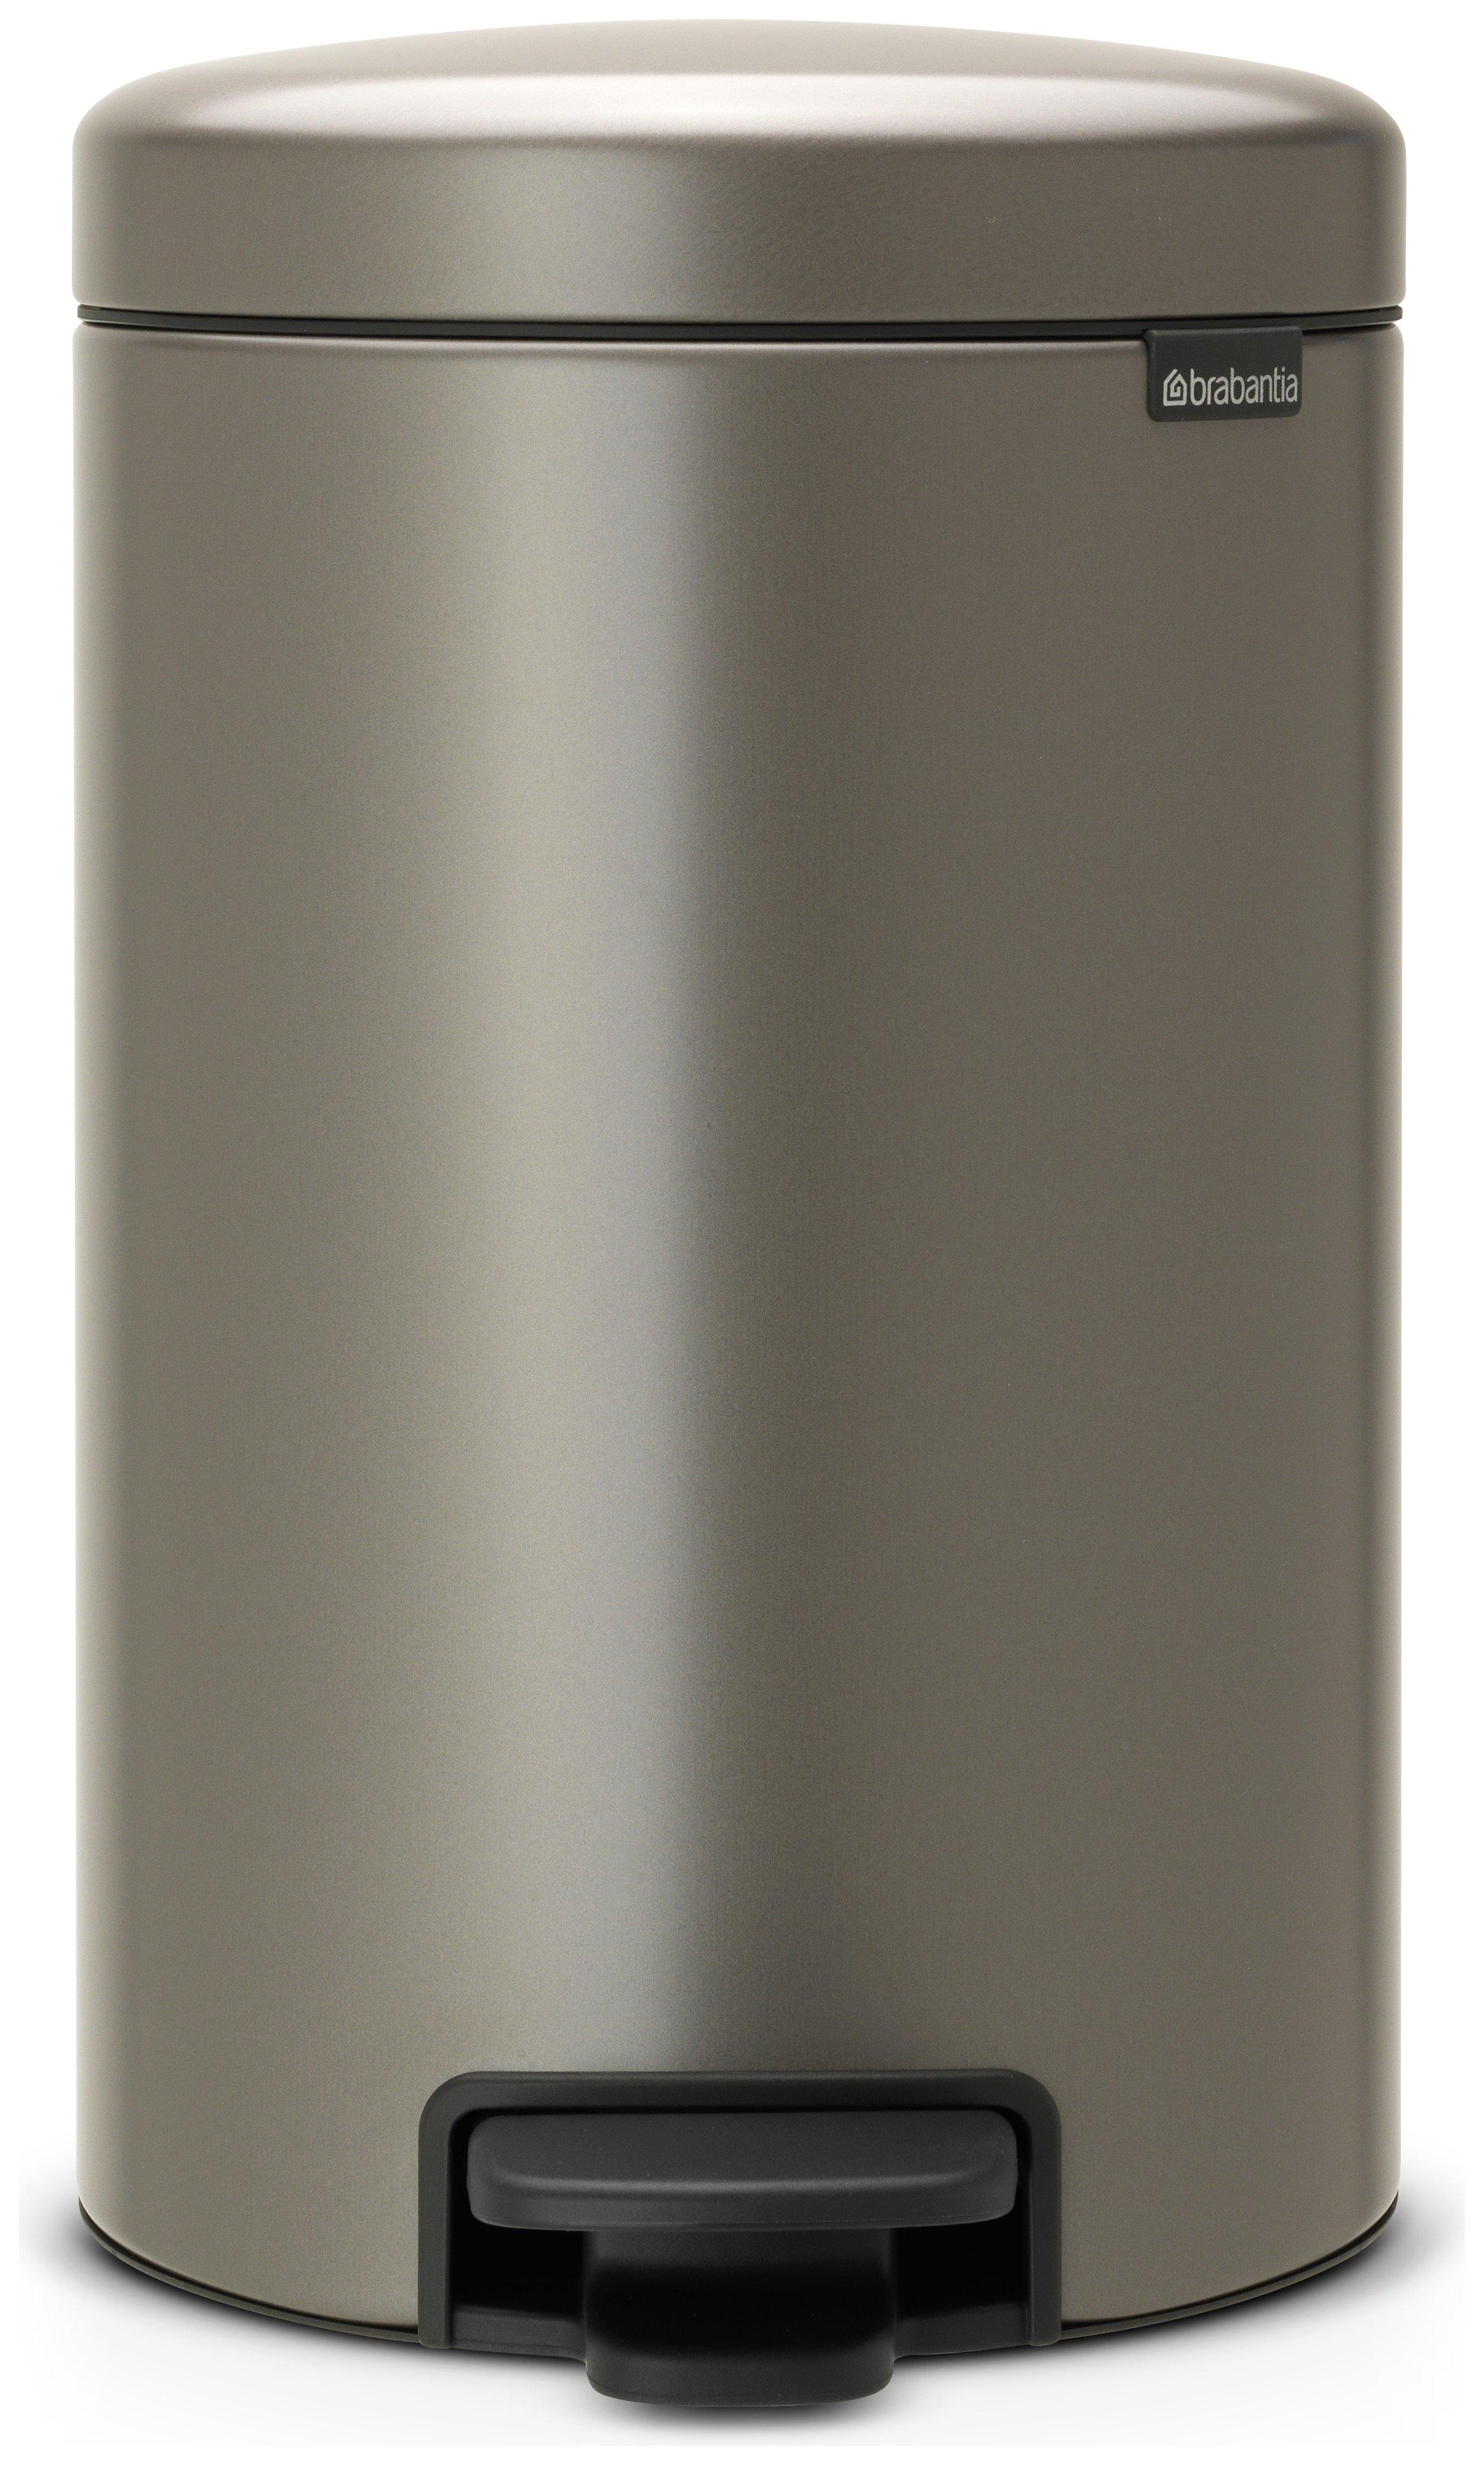 brabantia-newicon-12-litre-pedal-bin-platinum